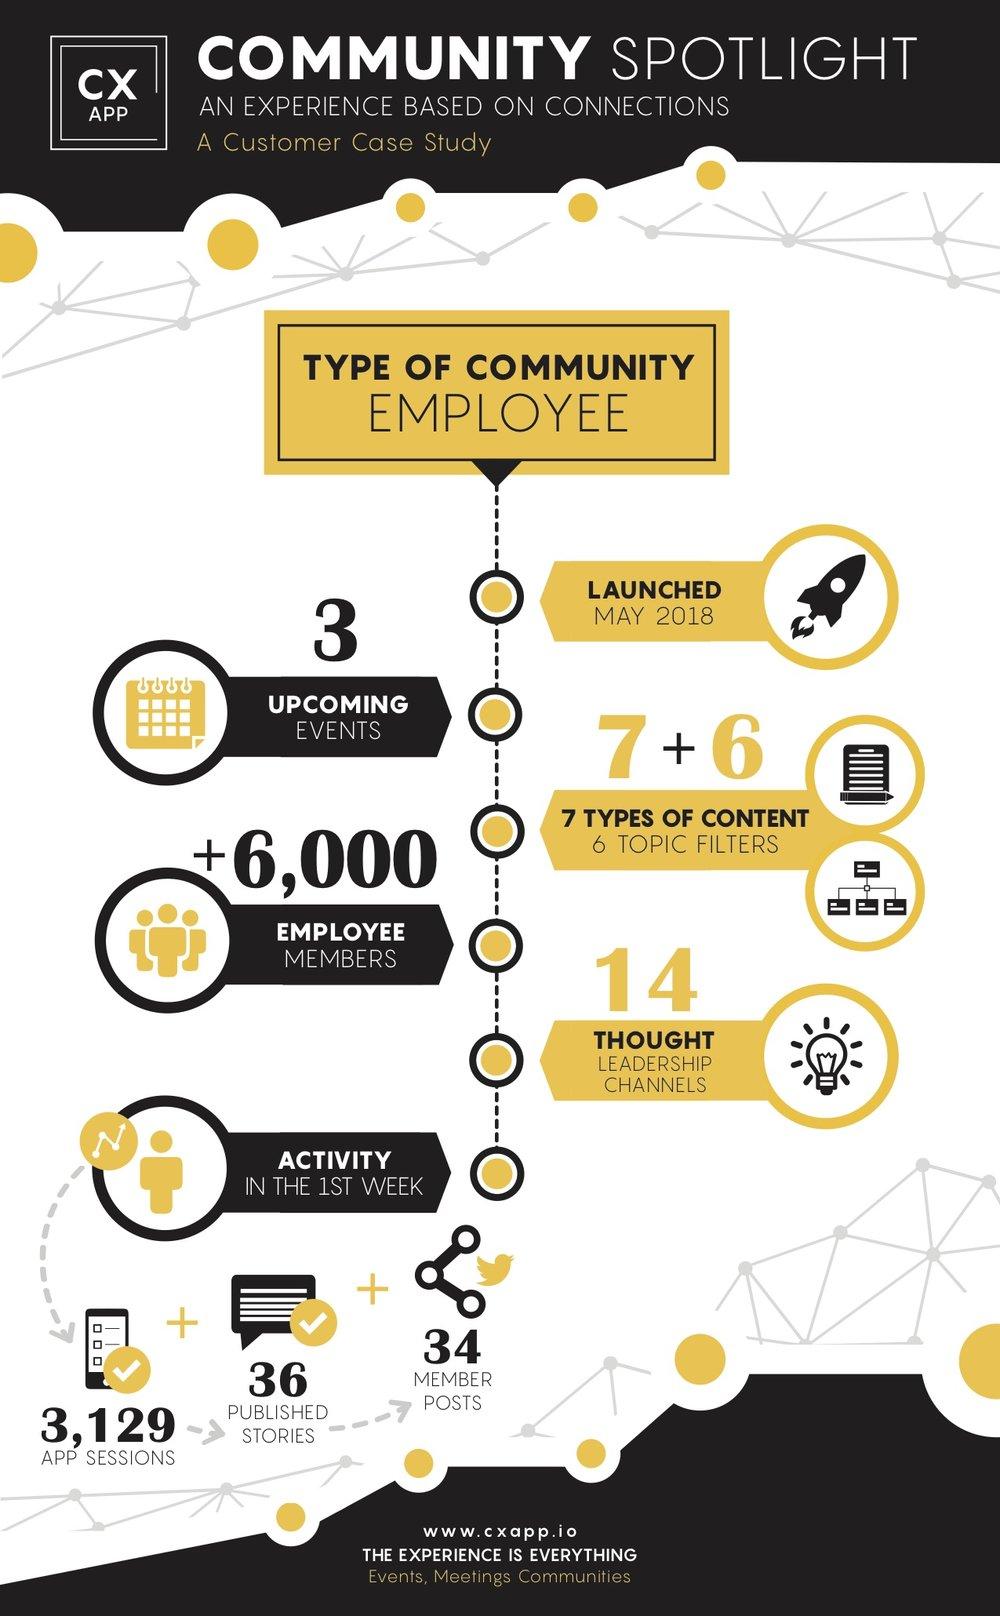 communitySpotlight_LenovoEmployeeDCG.jpg